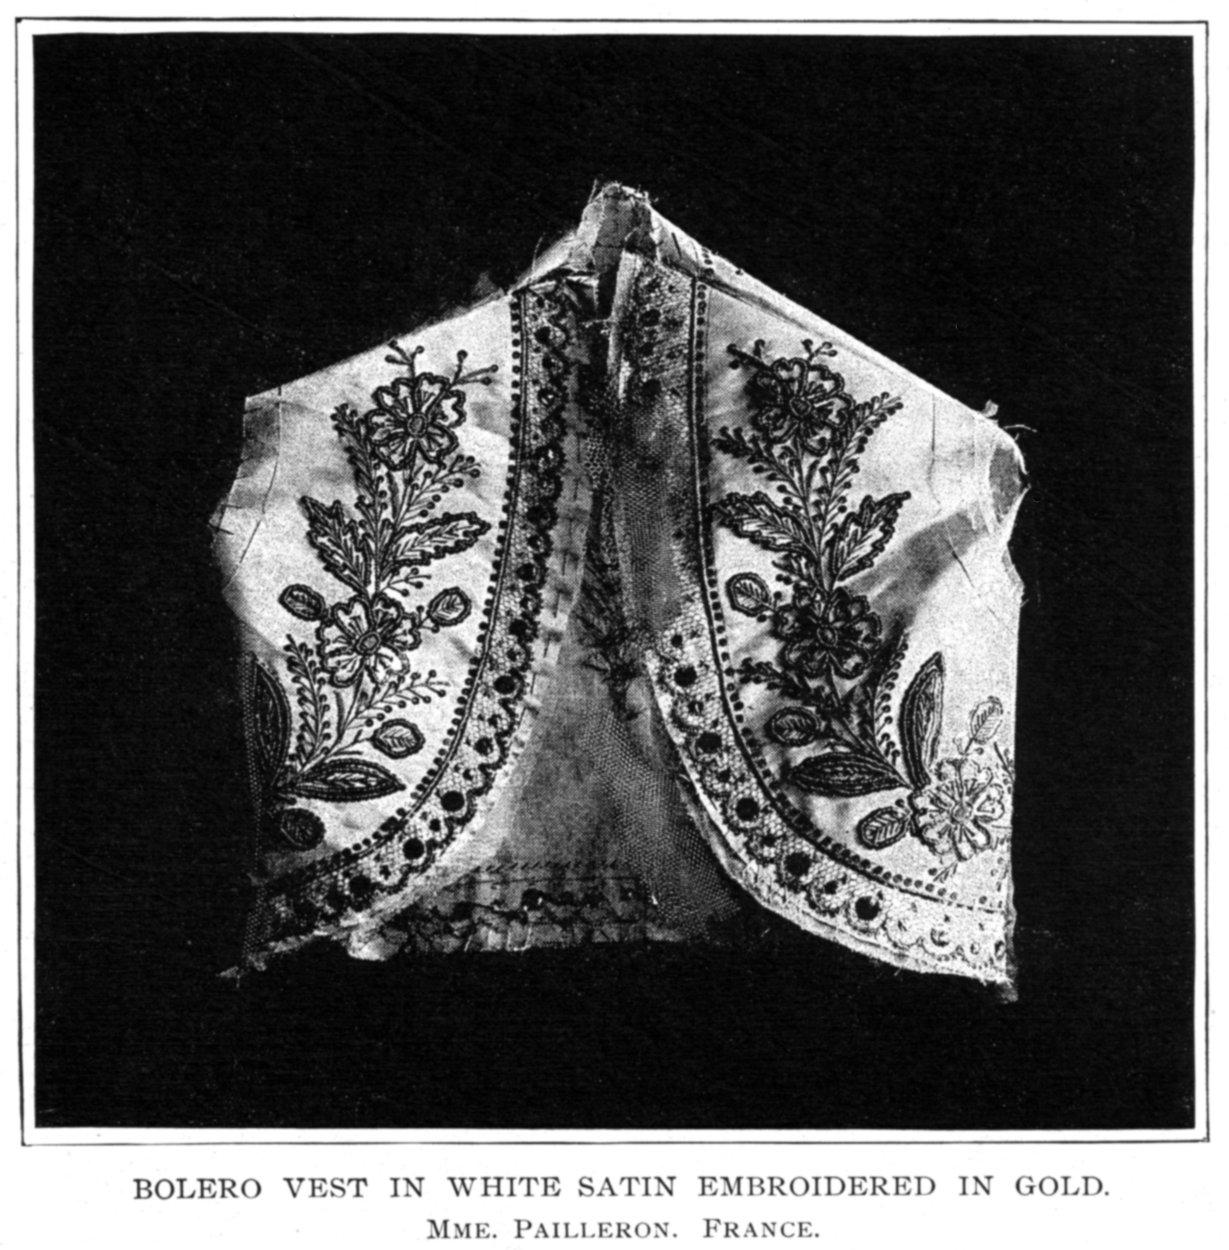 Satin Pillowcase Dublin: Embroidery, Lace, Needlework And Macrame · Women's Art Of